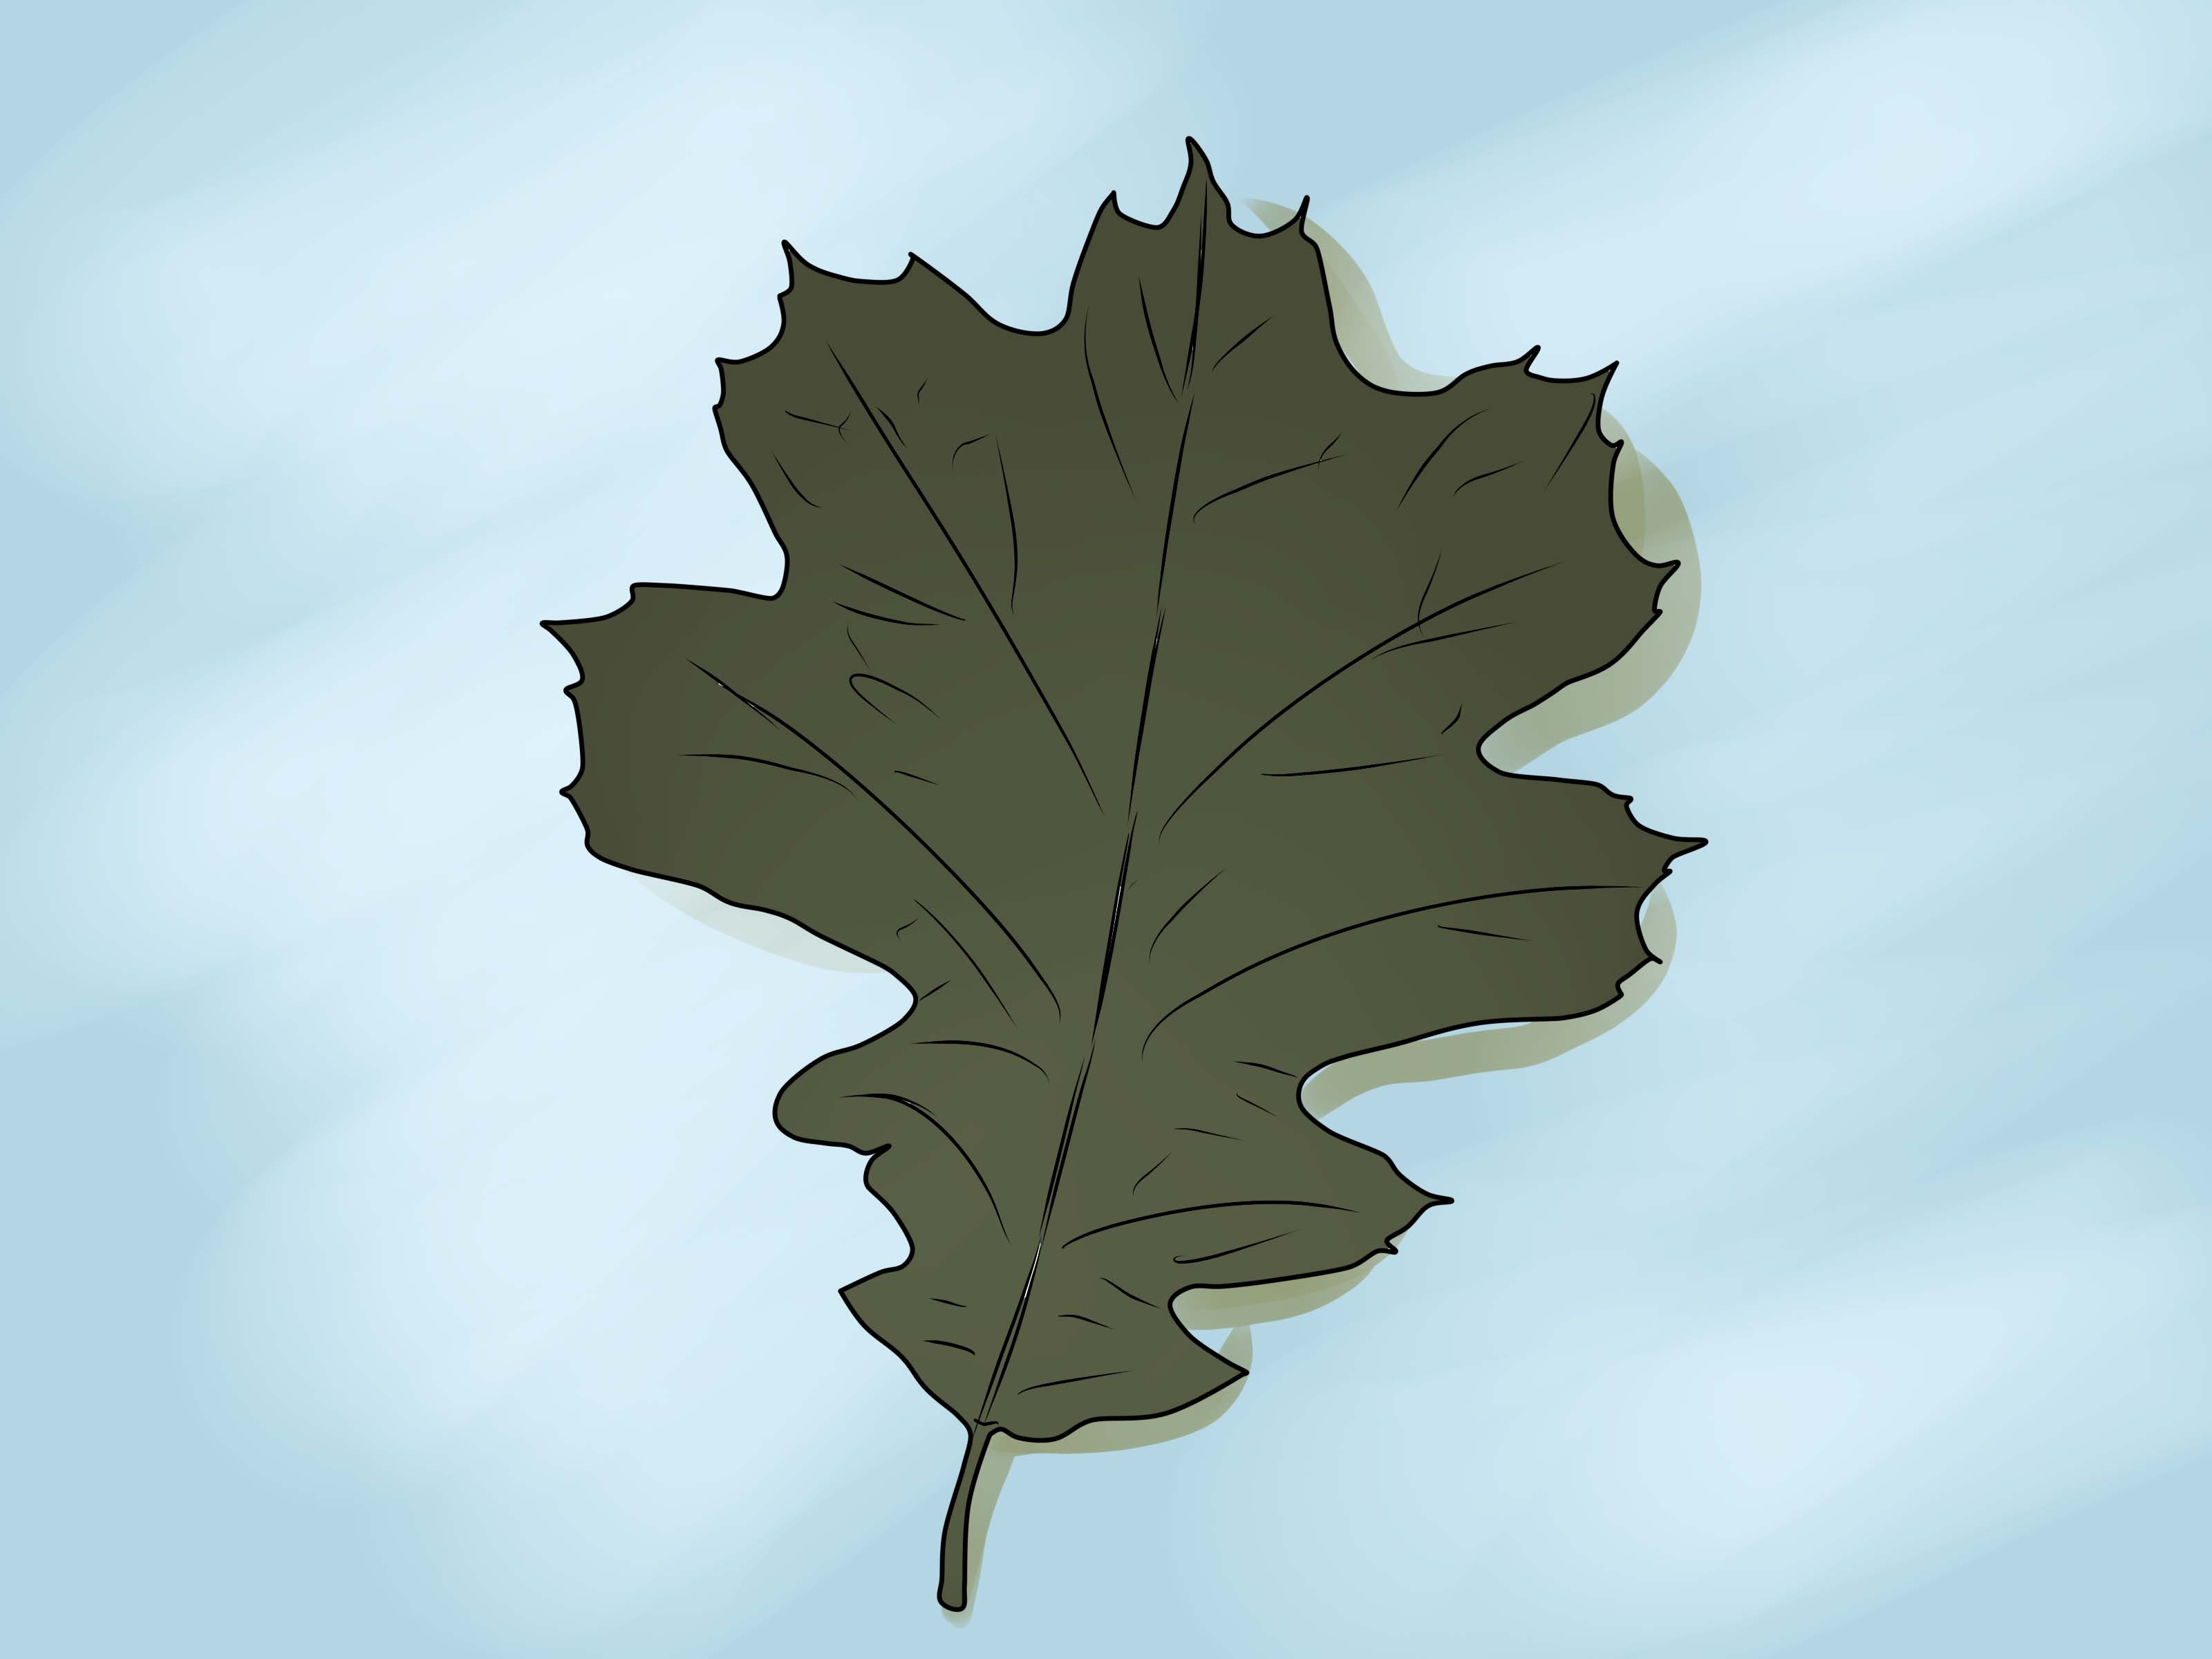 Oak leaf photo